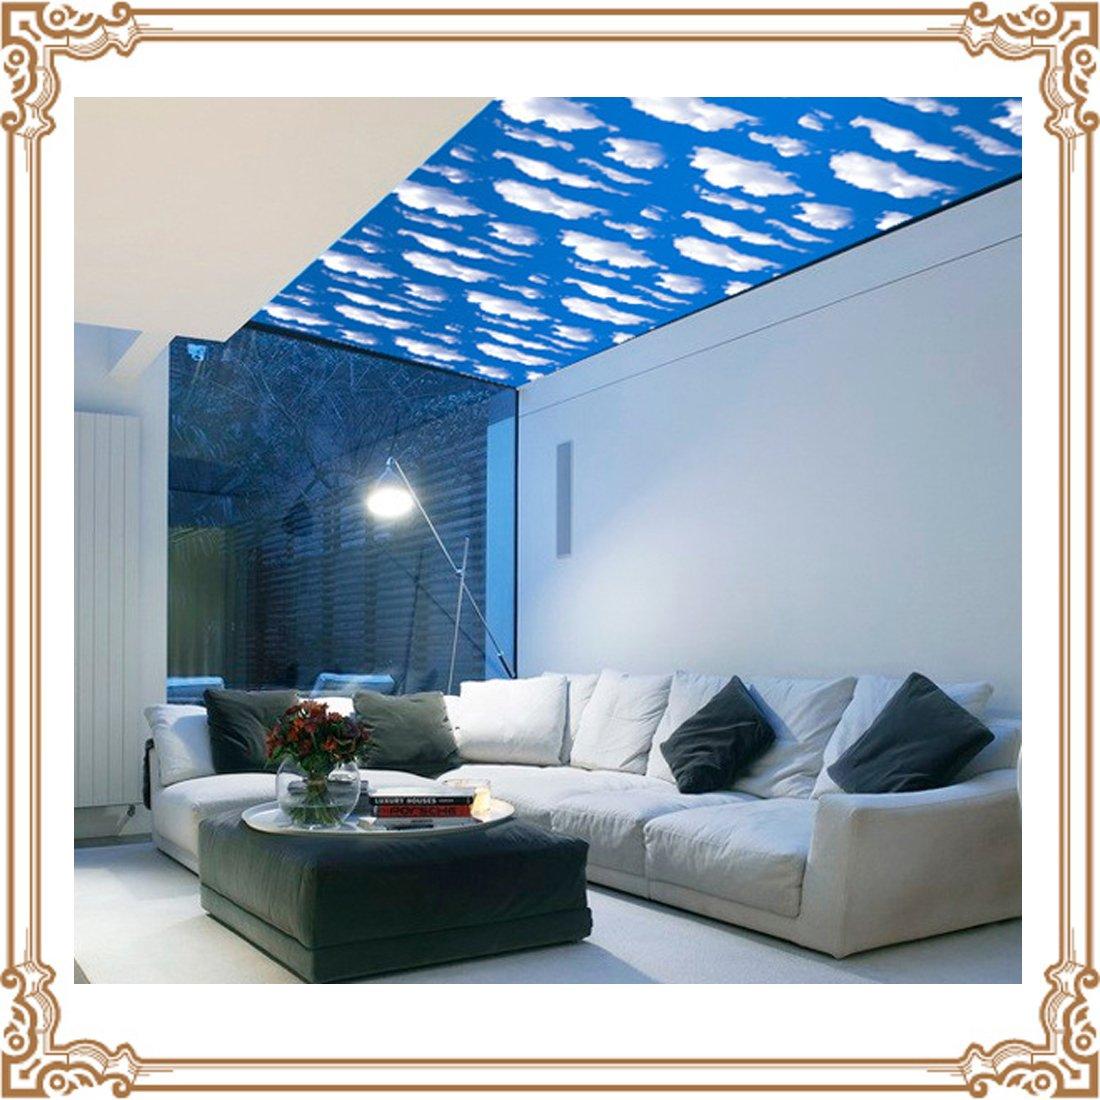 Painting Supplies & Wall Treatments Wallpapers Radient Custom Photo Wallpaper 3d Space Wallpaper Blue Ocean Waves Wallpaper Children Room Bedside Surge Wallpaper Mural